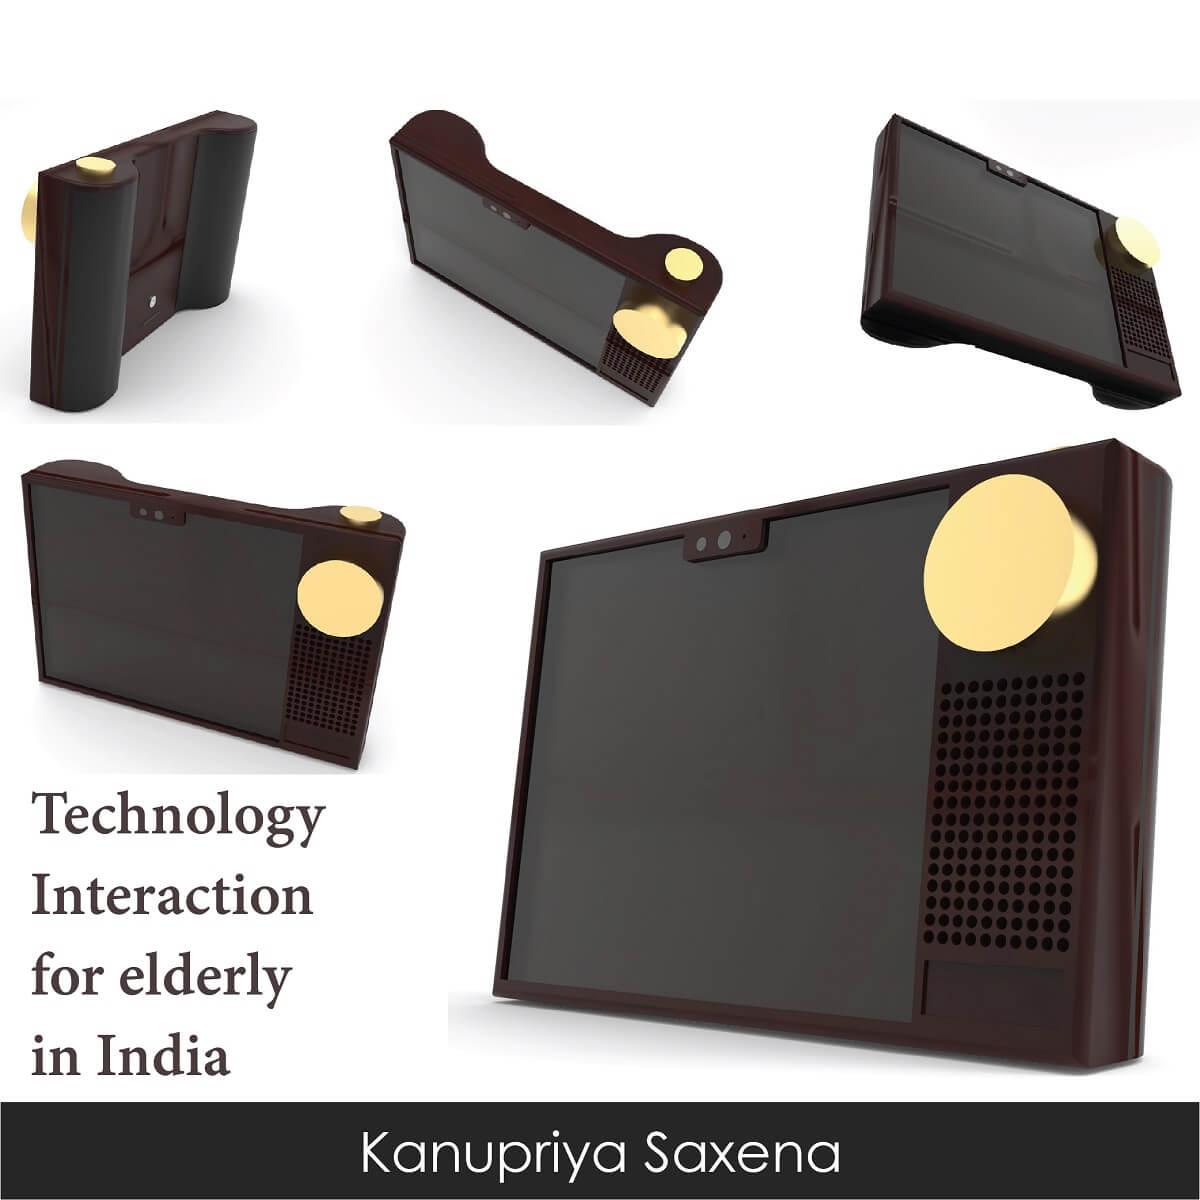 Student Work - Kanupriya Saxena